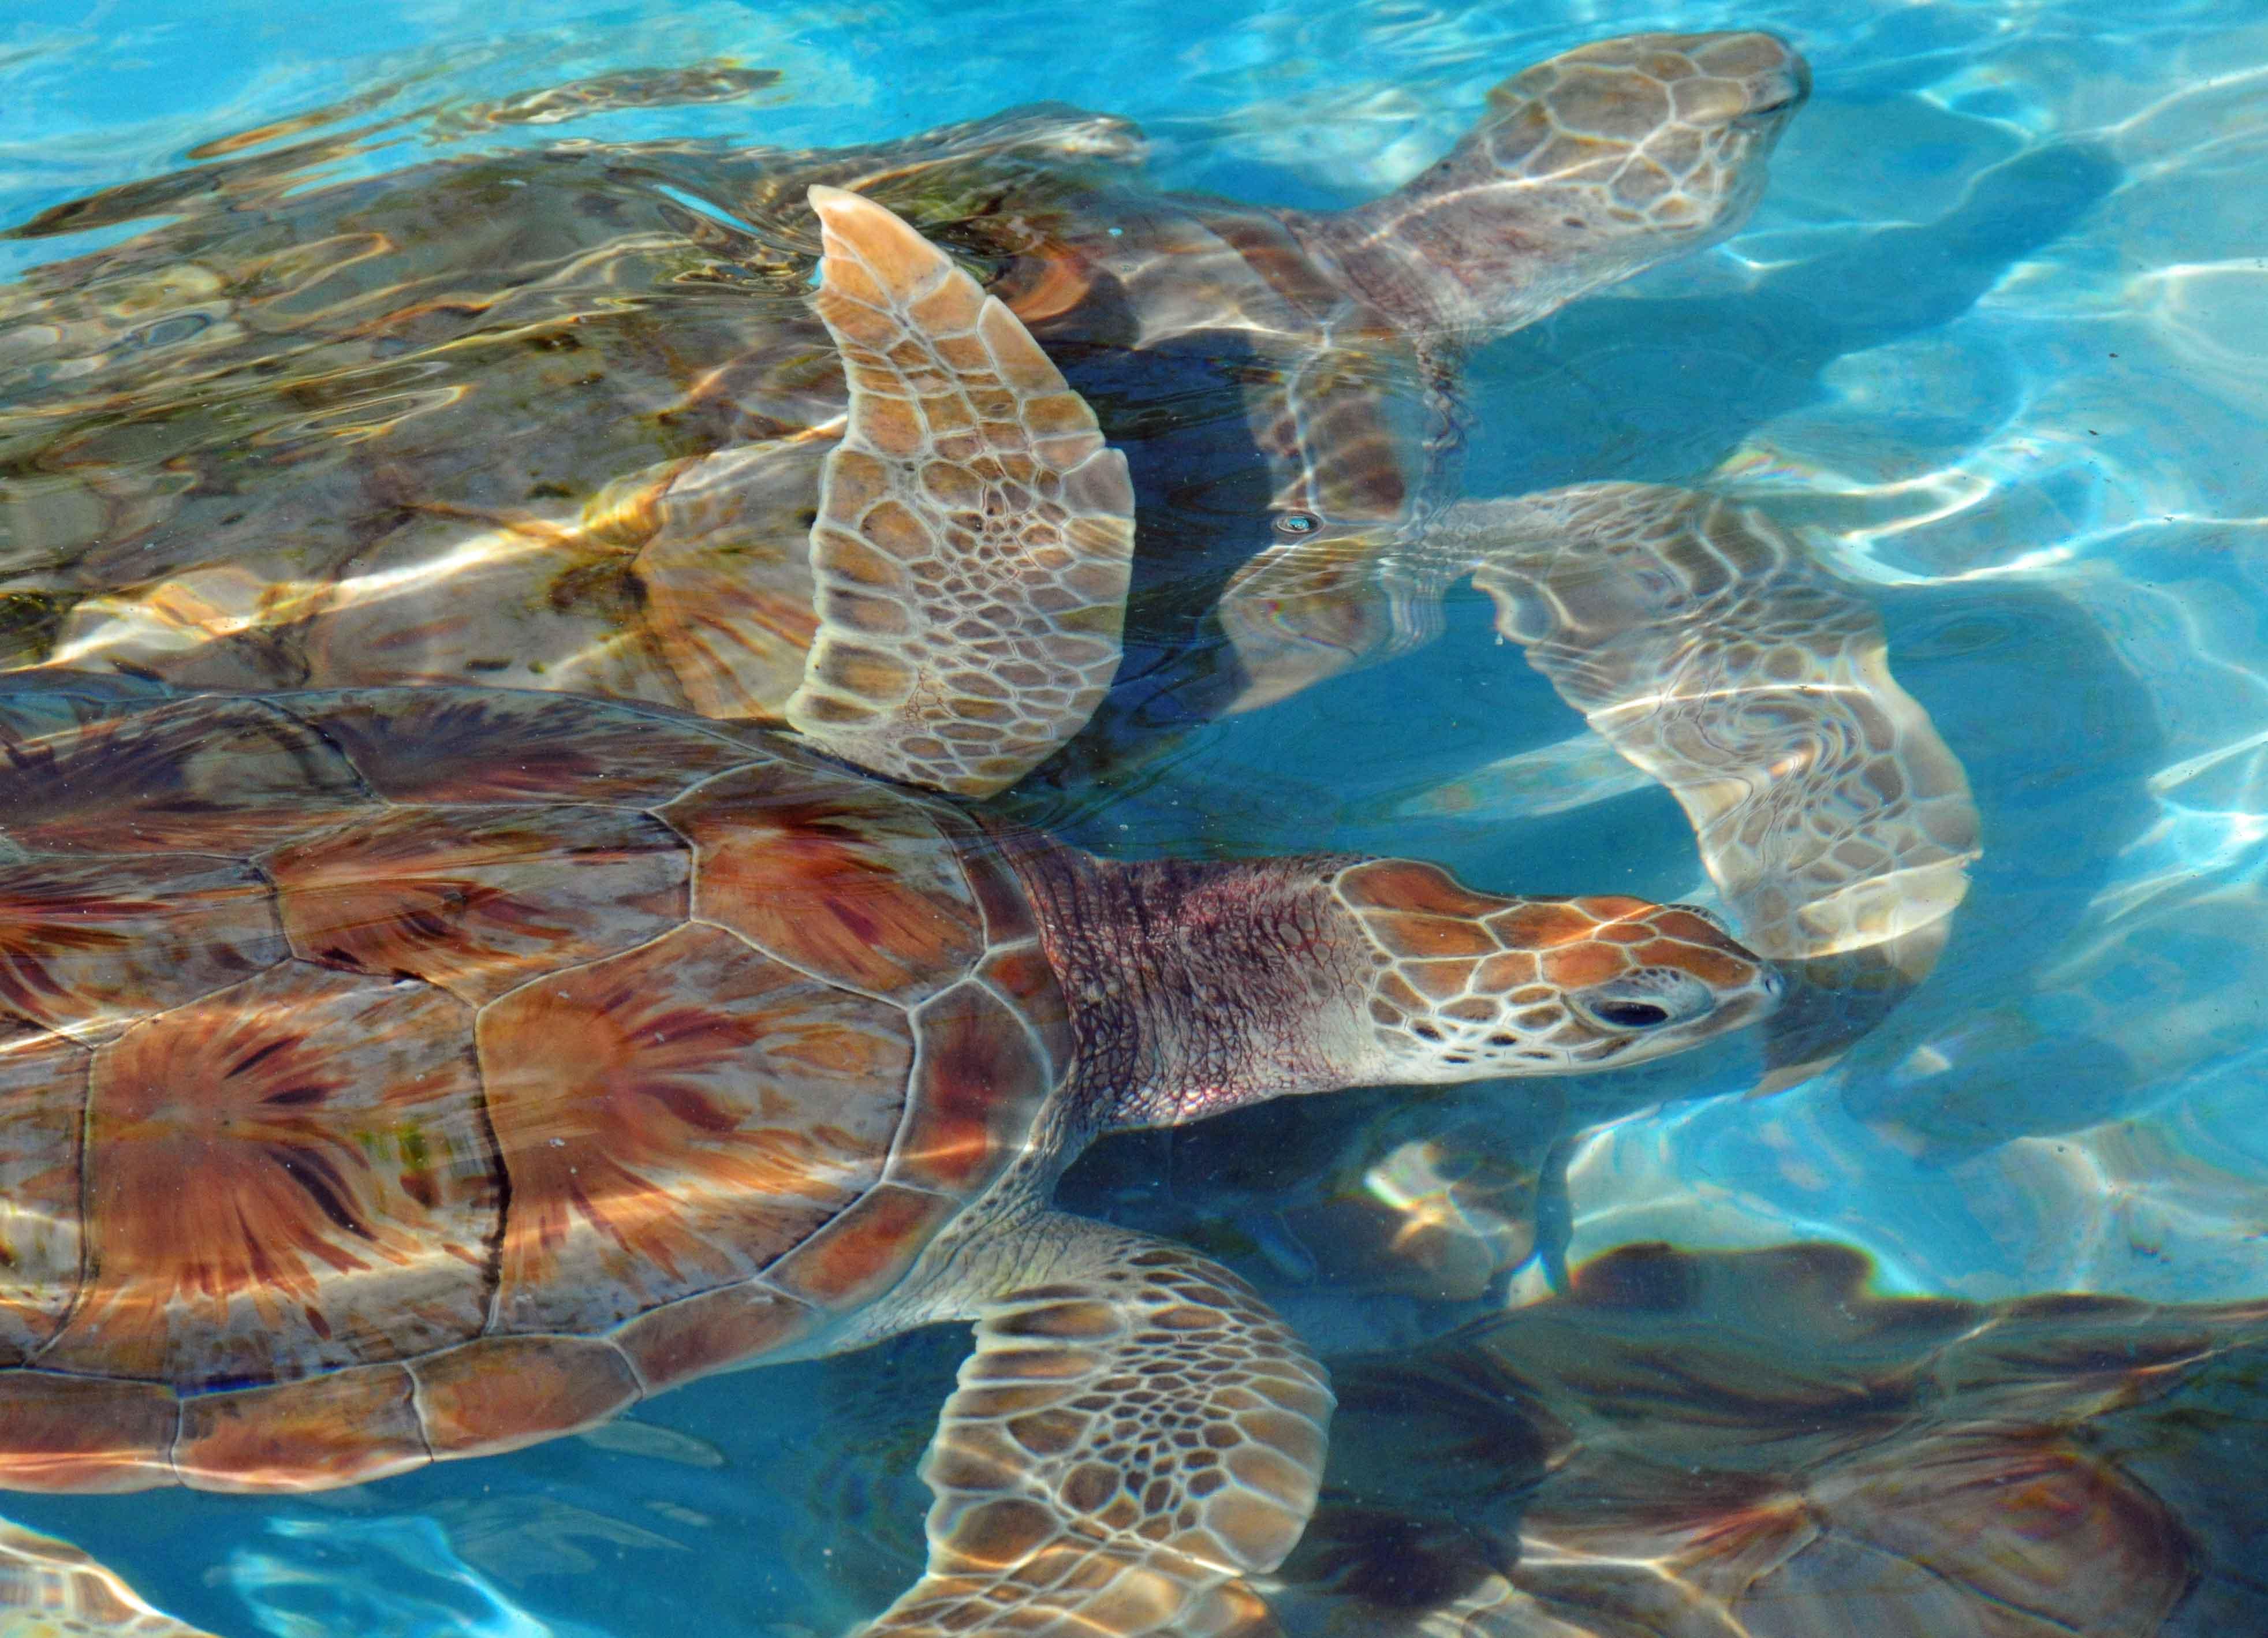 turtles_DSC_4605